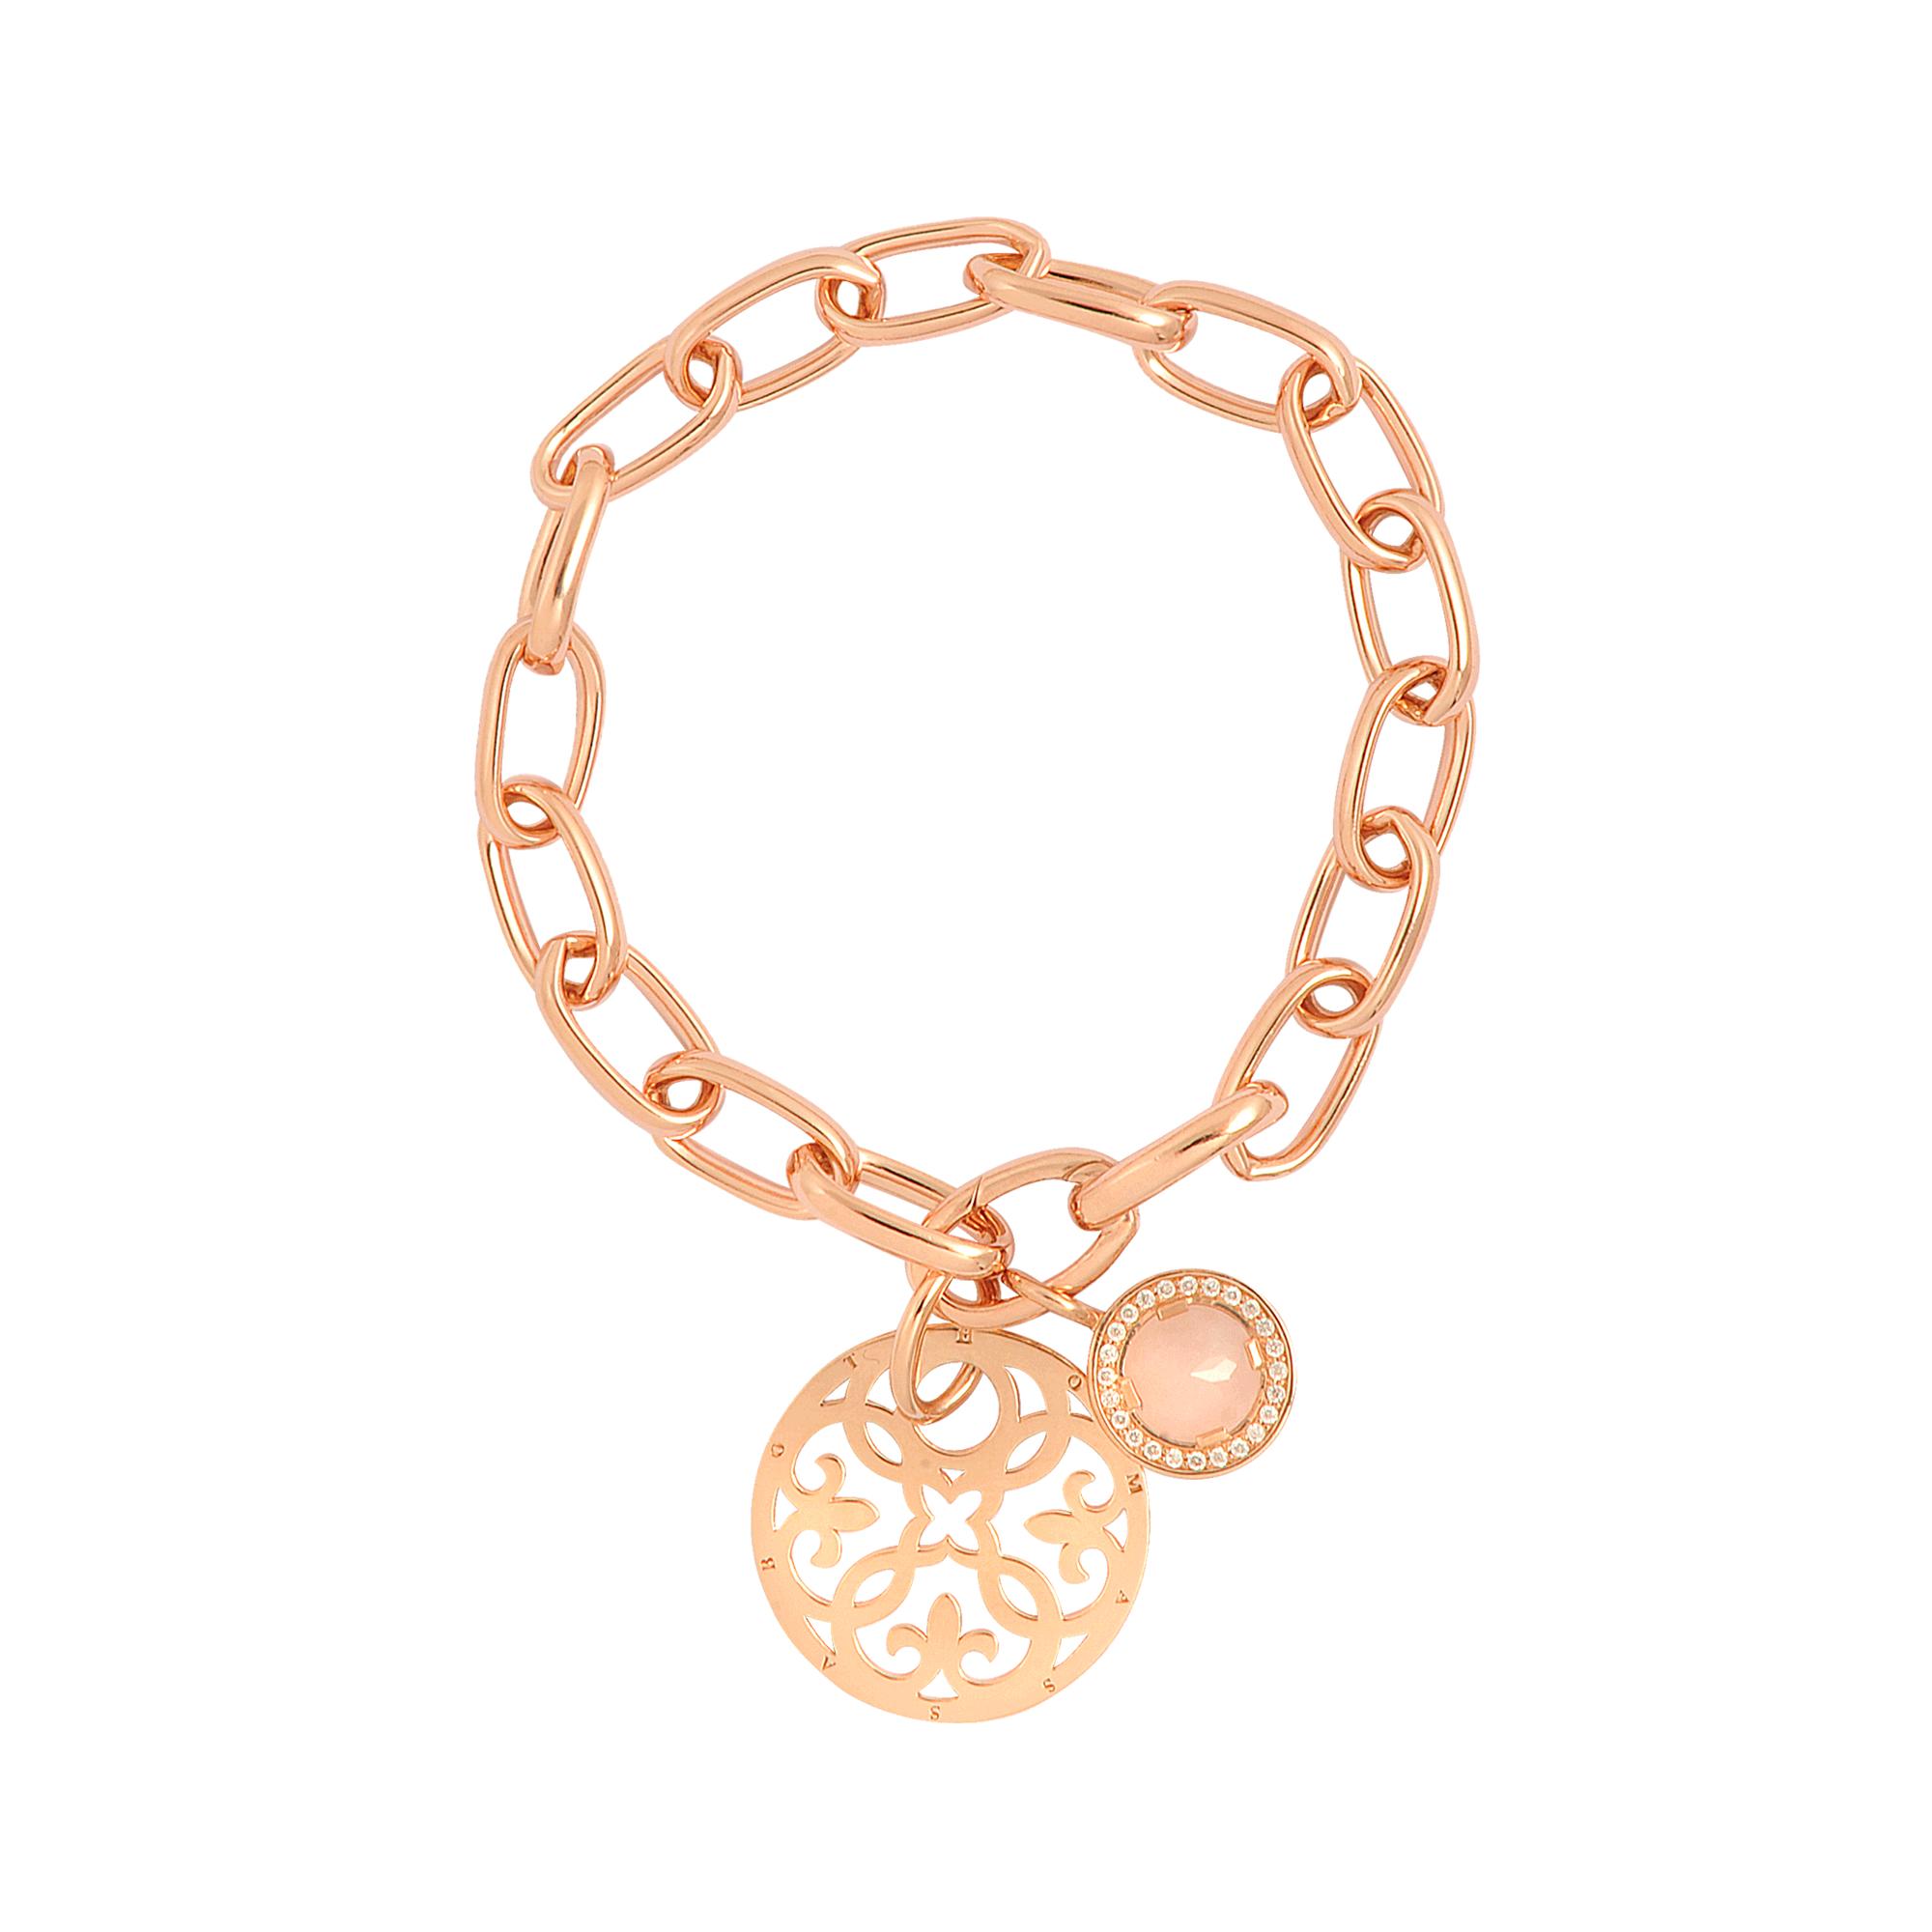 Thomas Sabo Rose Gold Charm Bracelet in Pink  Lyst